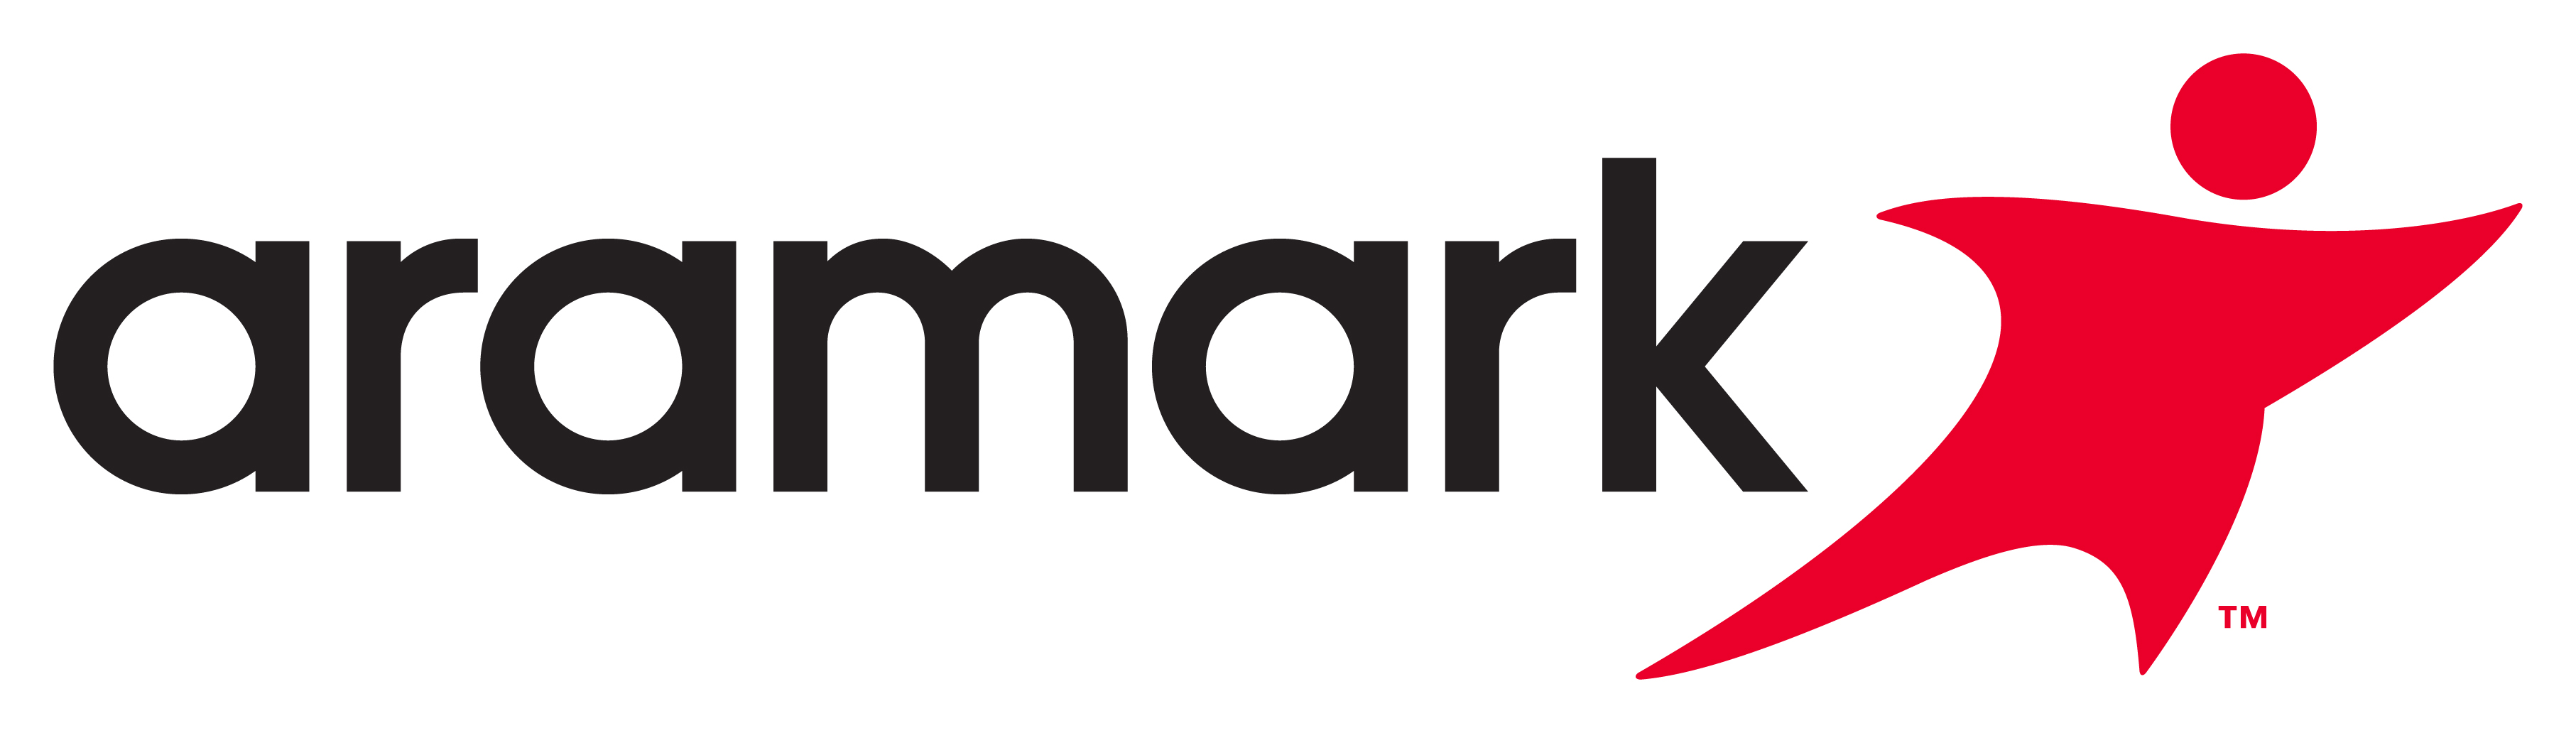 Aramark Webmail Logo